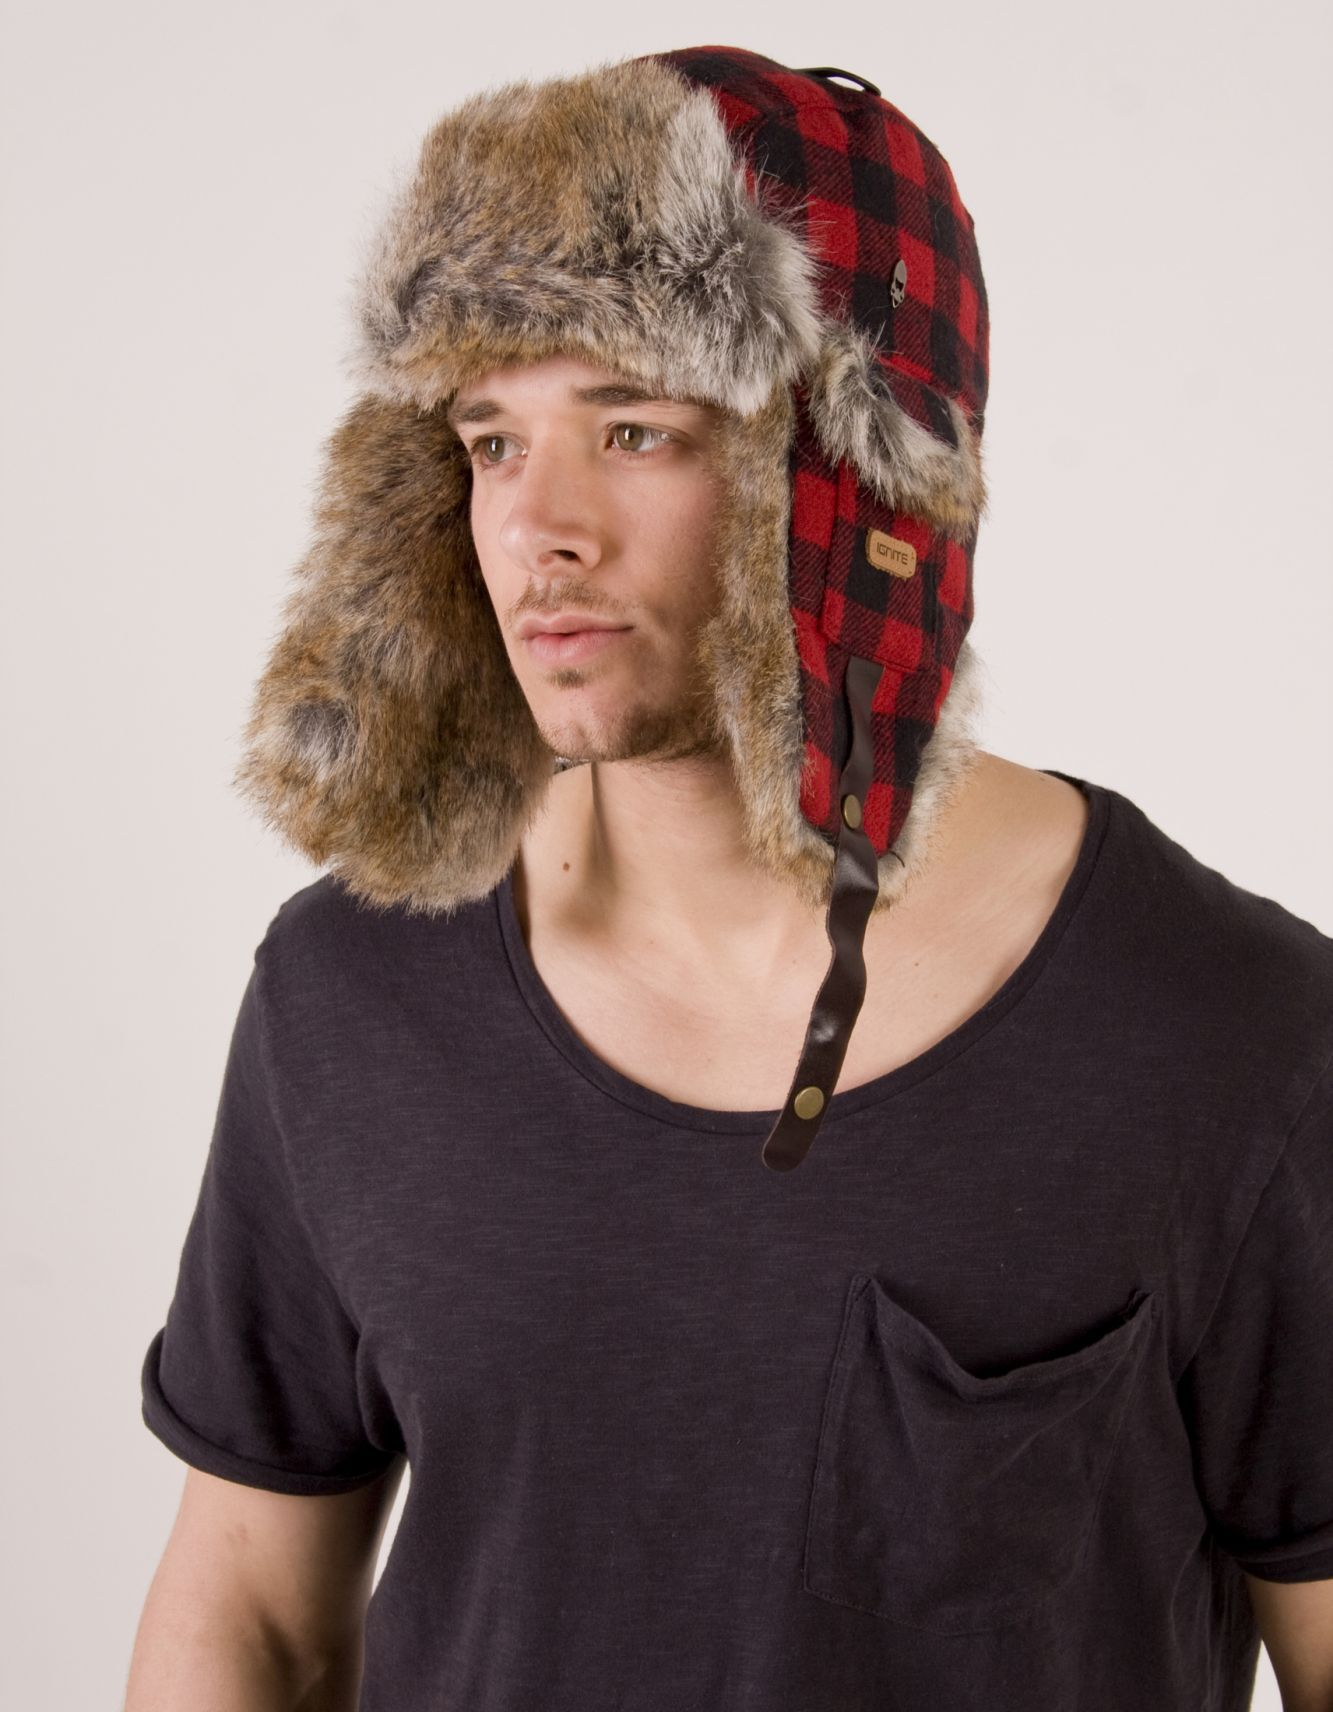 L 2xl Elmer Fudd Hats Hunters Hat Lumberjack Red Black Plaid Check